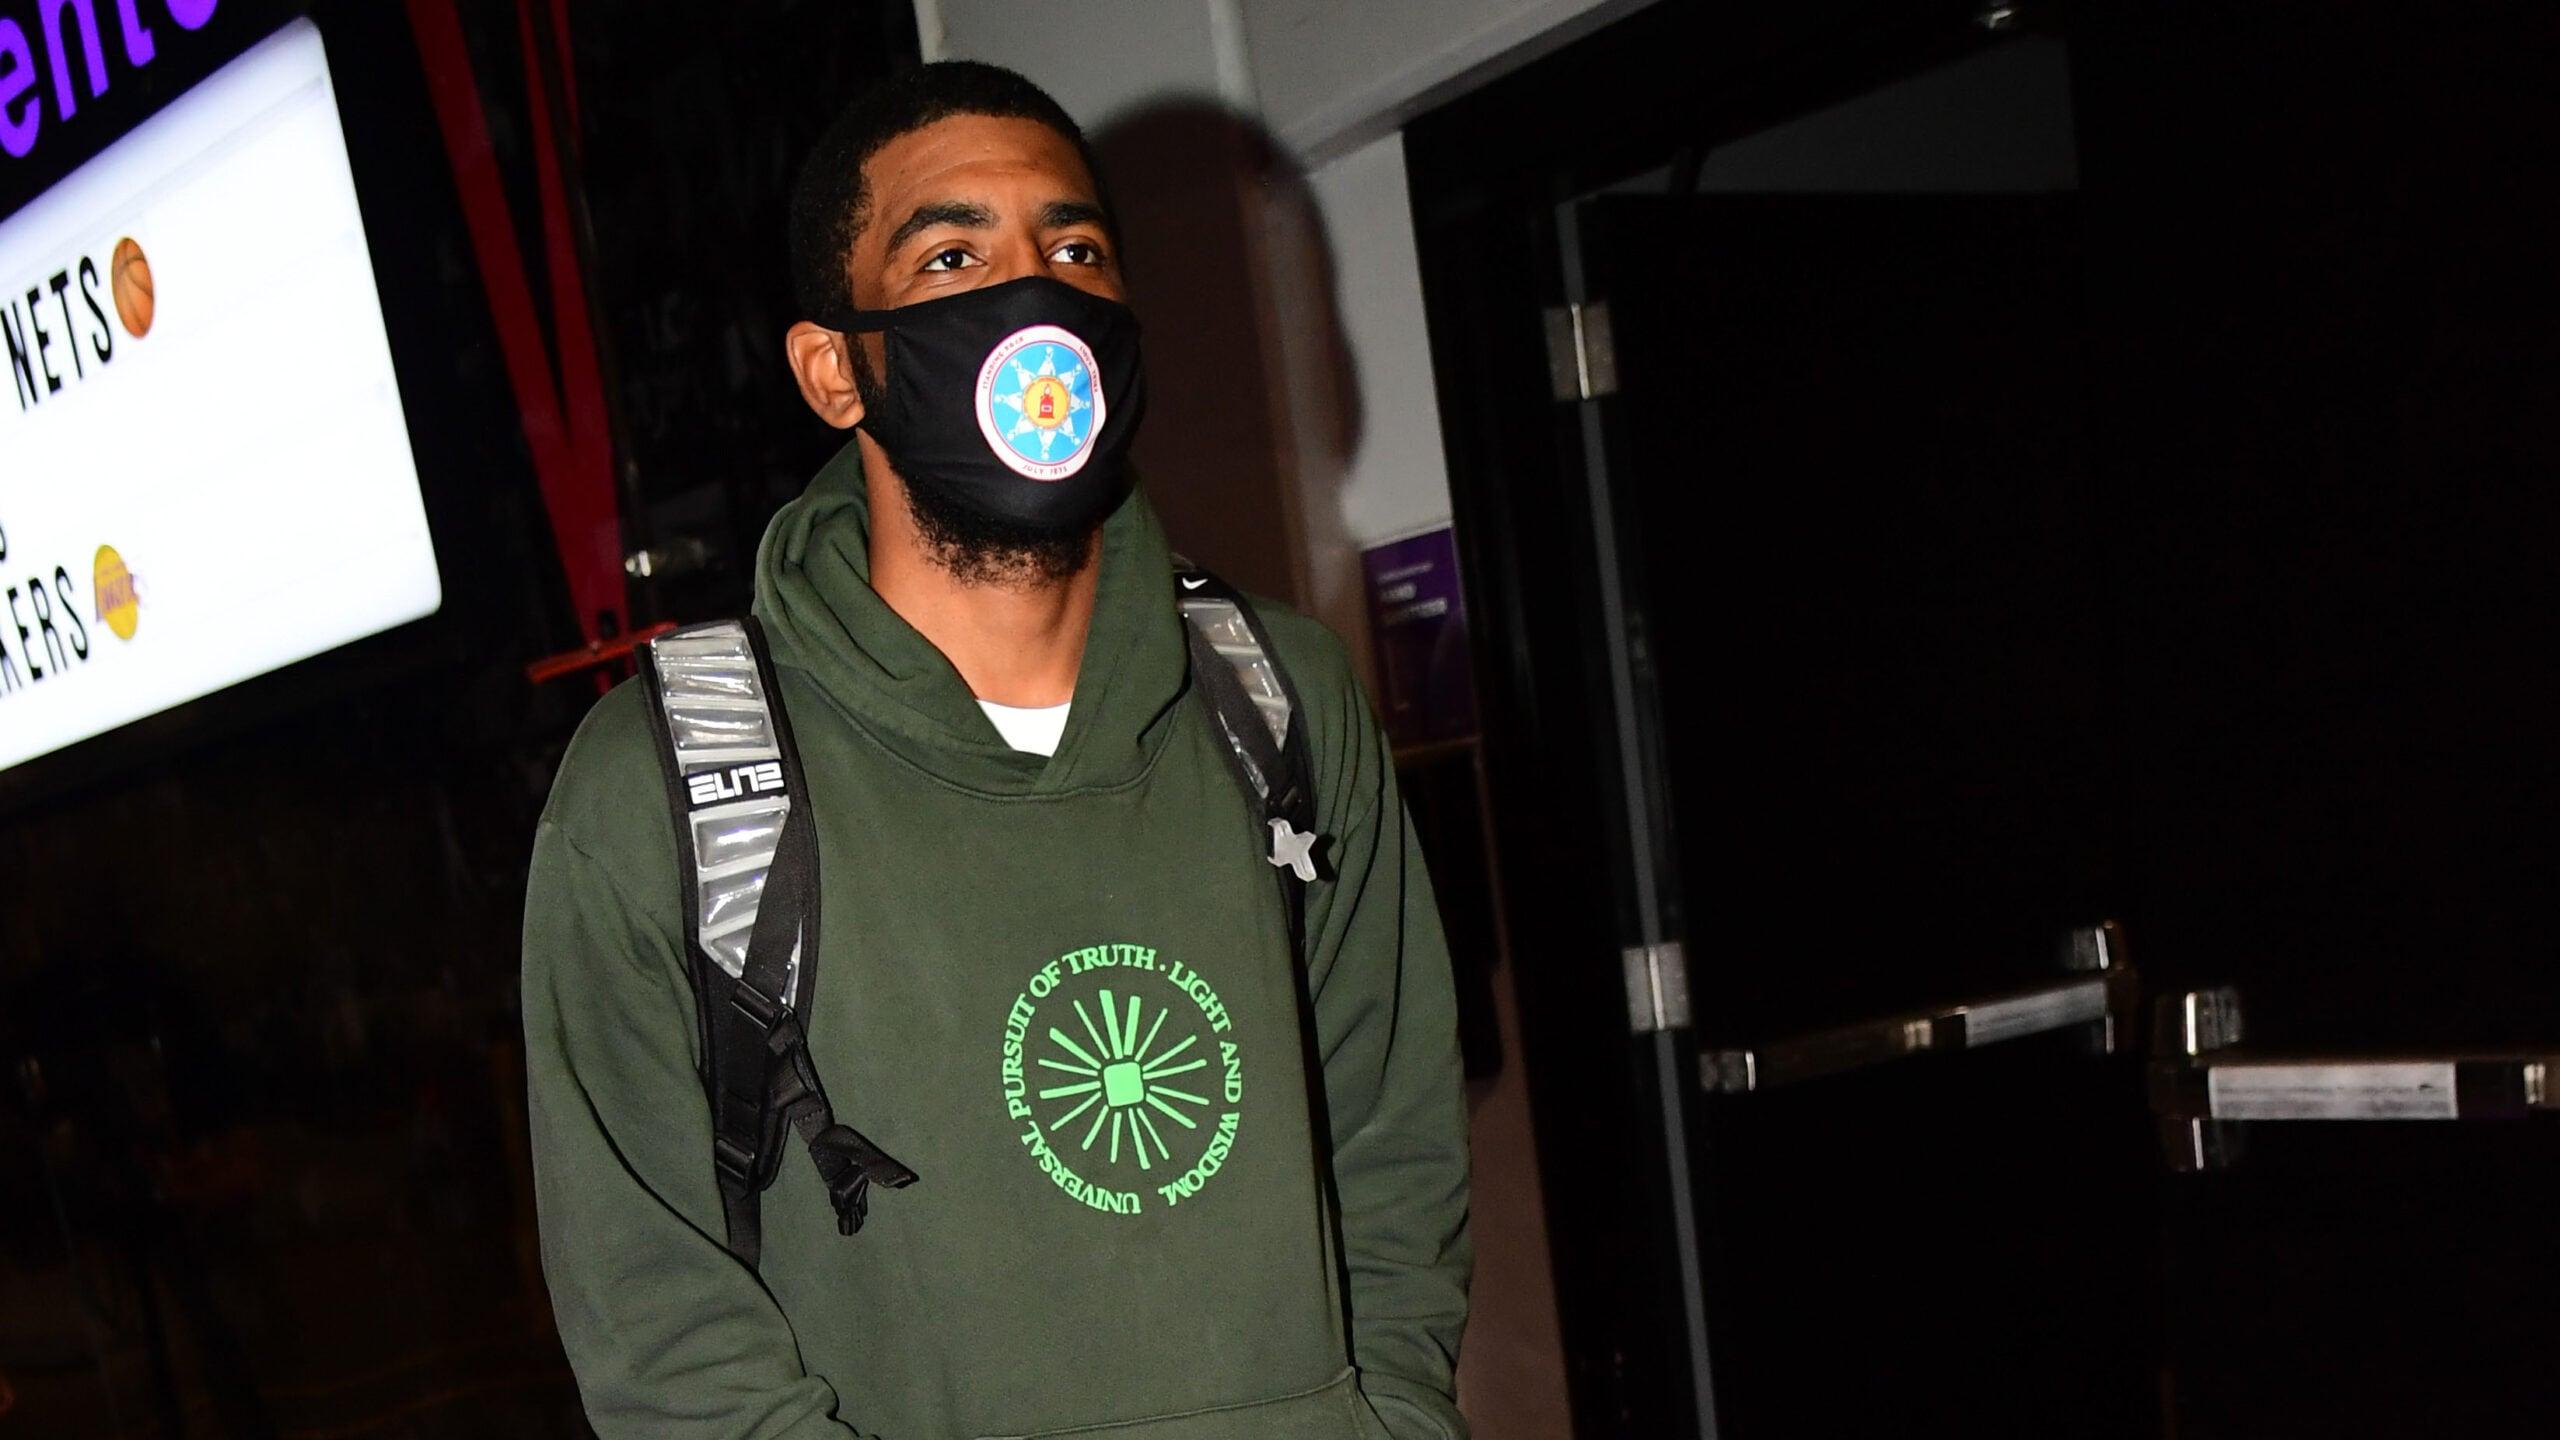 Kyrie Irving rejoins Nets practice; Steve Nash acknowledges missing time likely